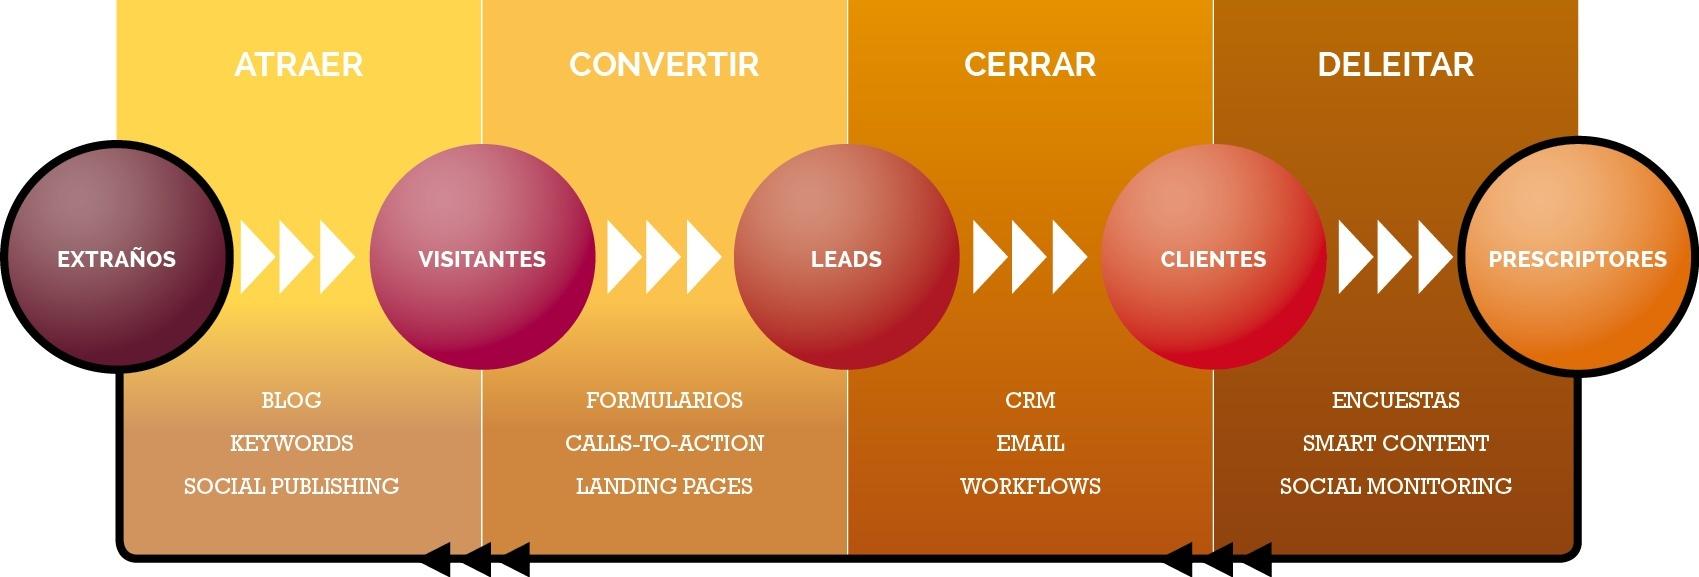 Inbound_Marketing._Metodología